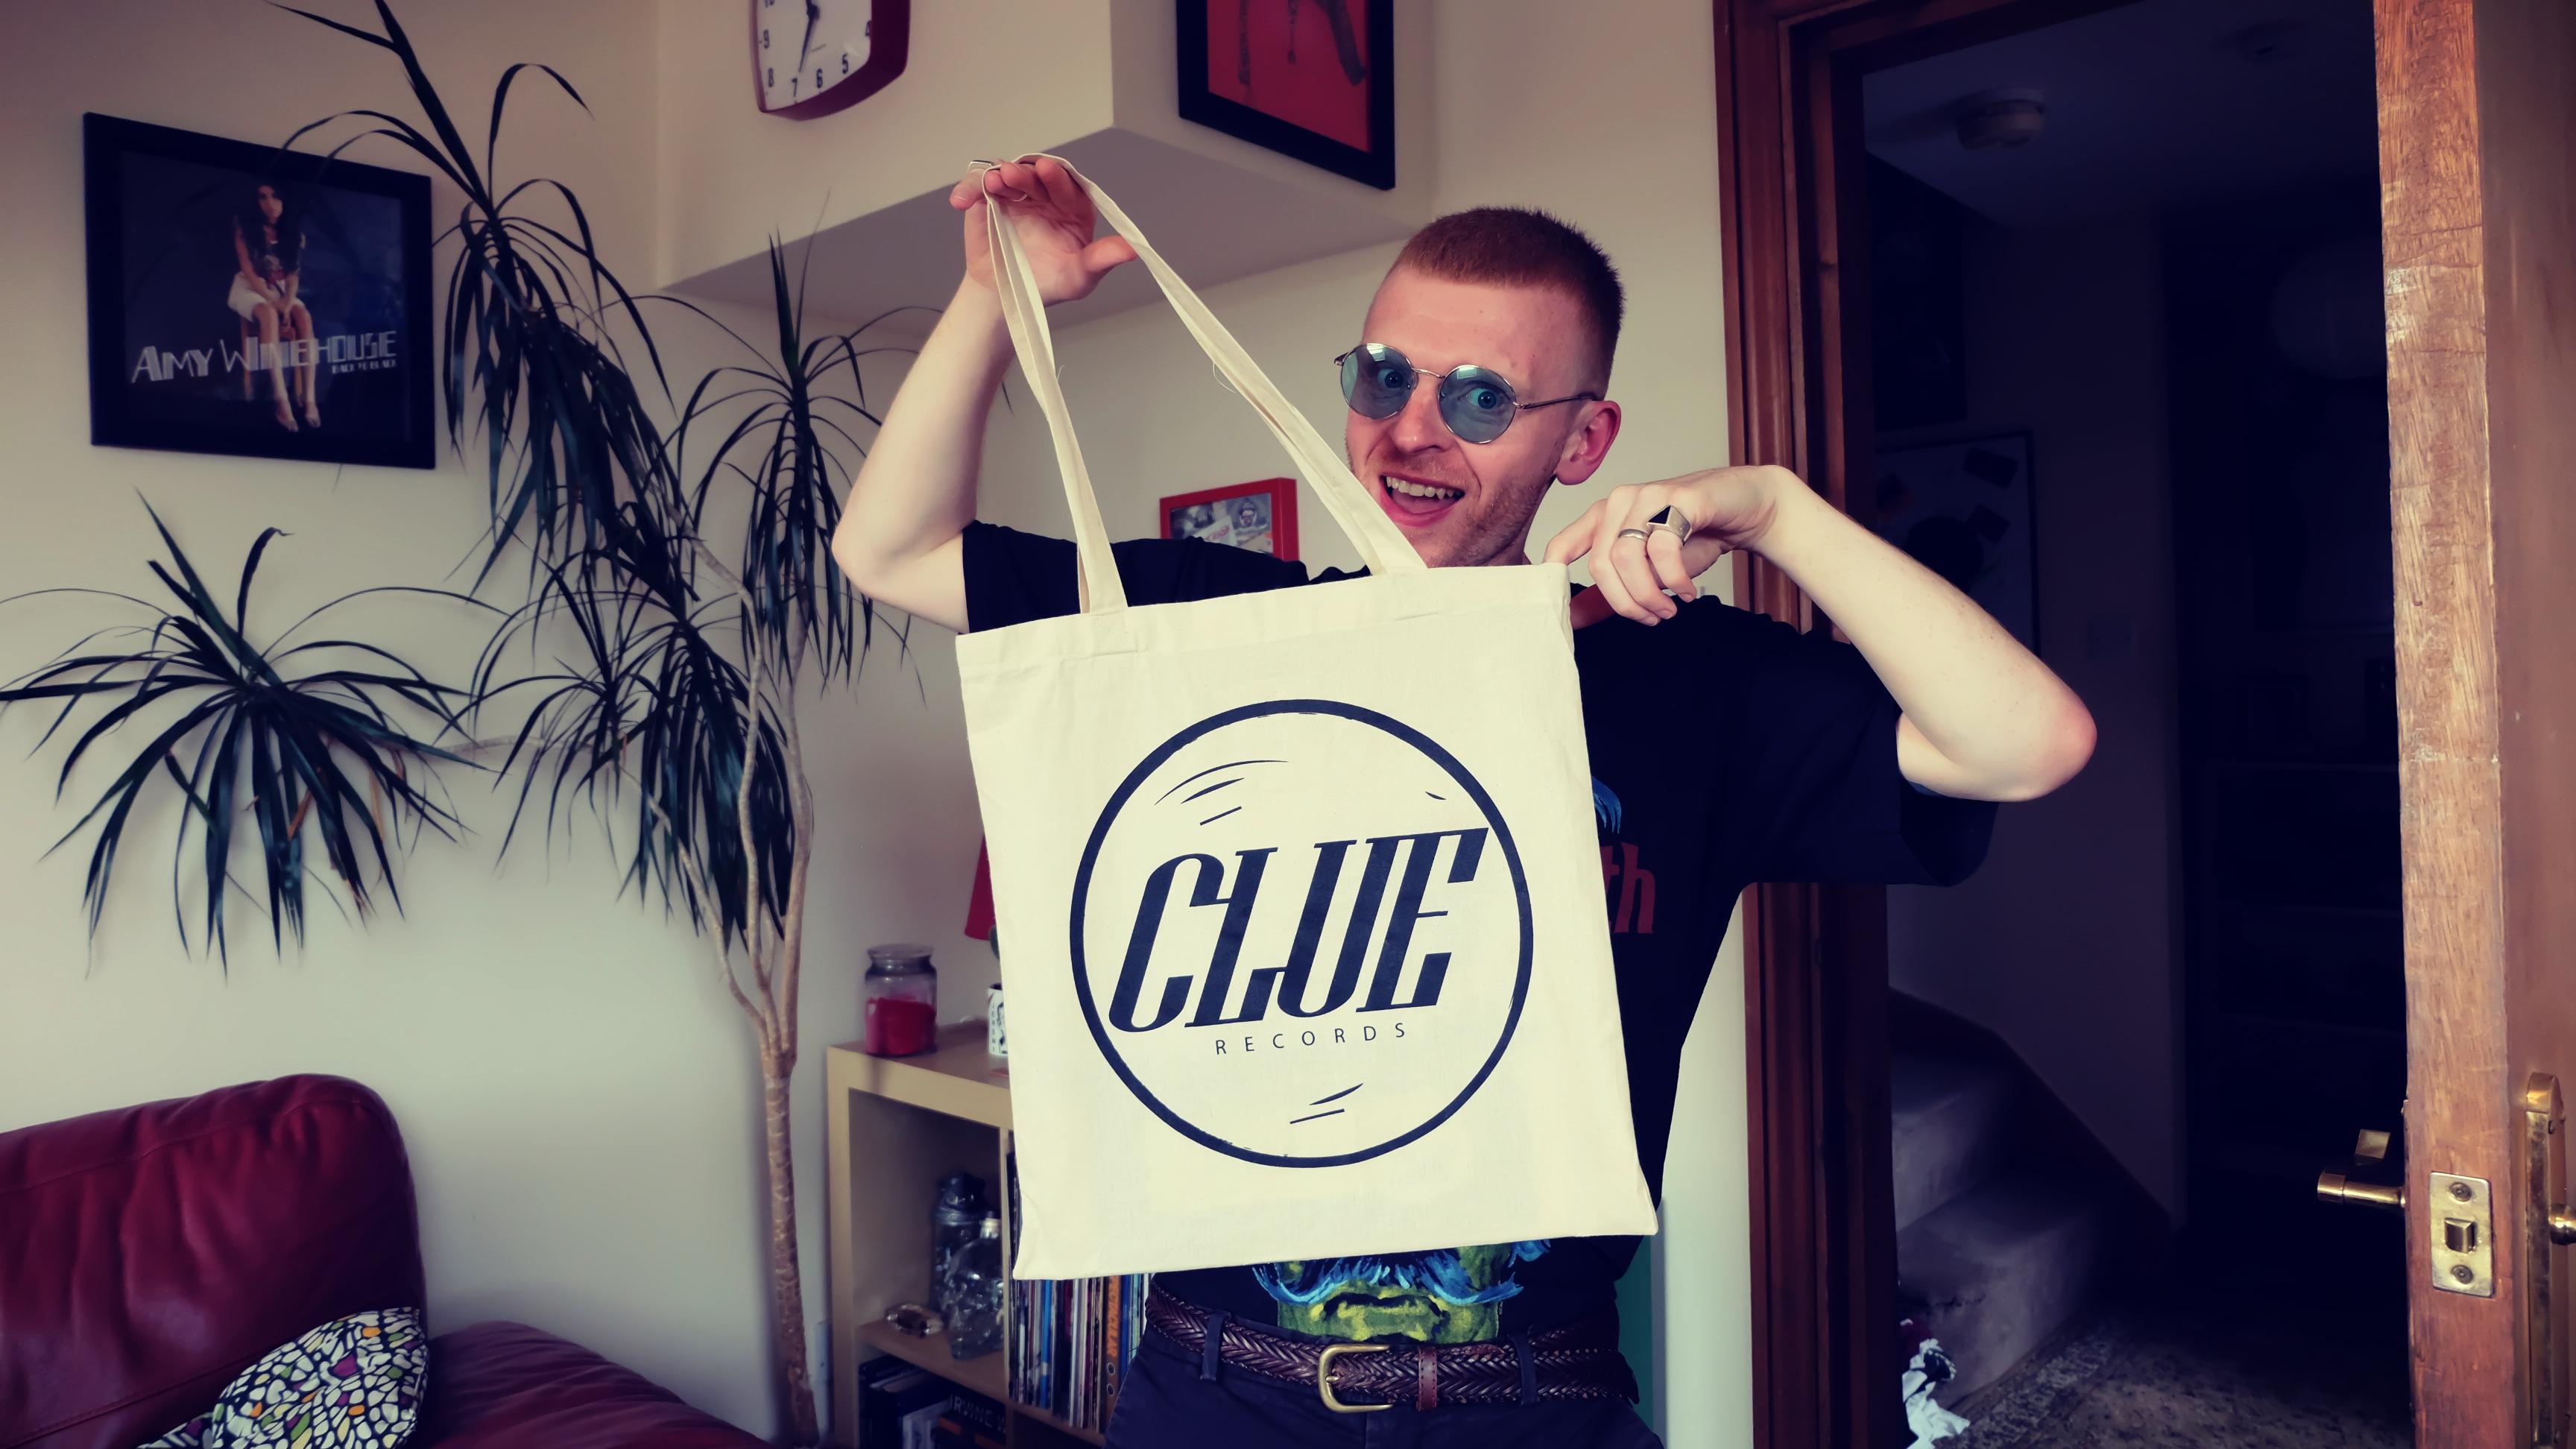 CLUE RECORDS TOTE BAG - Clue Records